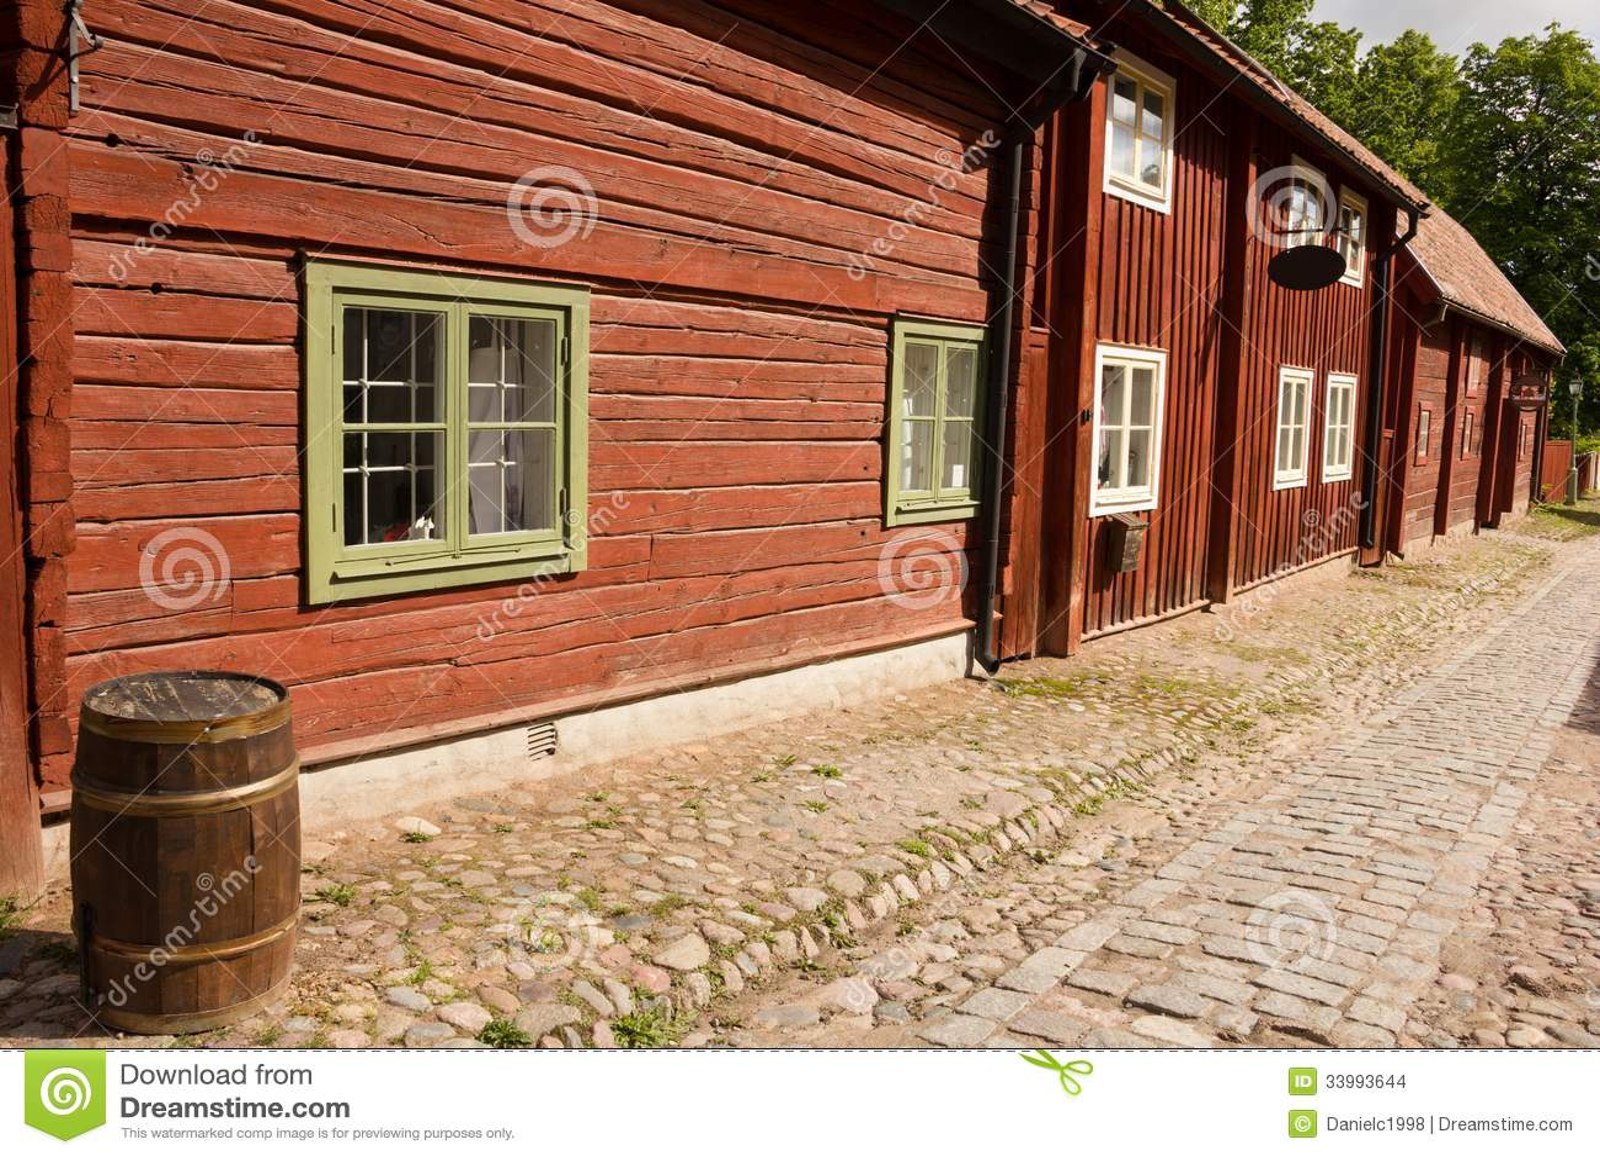 Typical scandinavian timber houses. Linkoping. Sweden